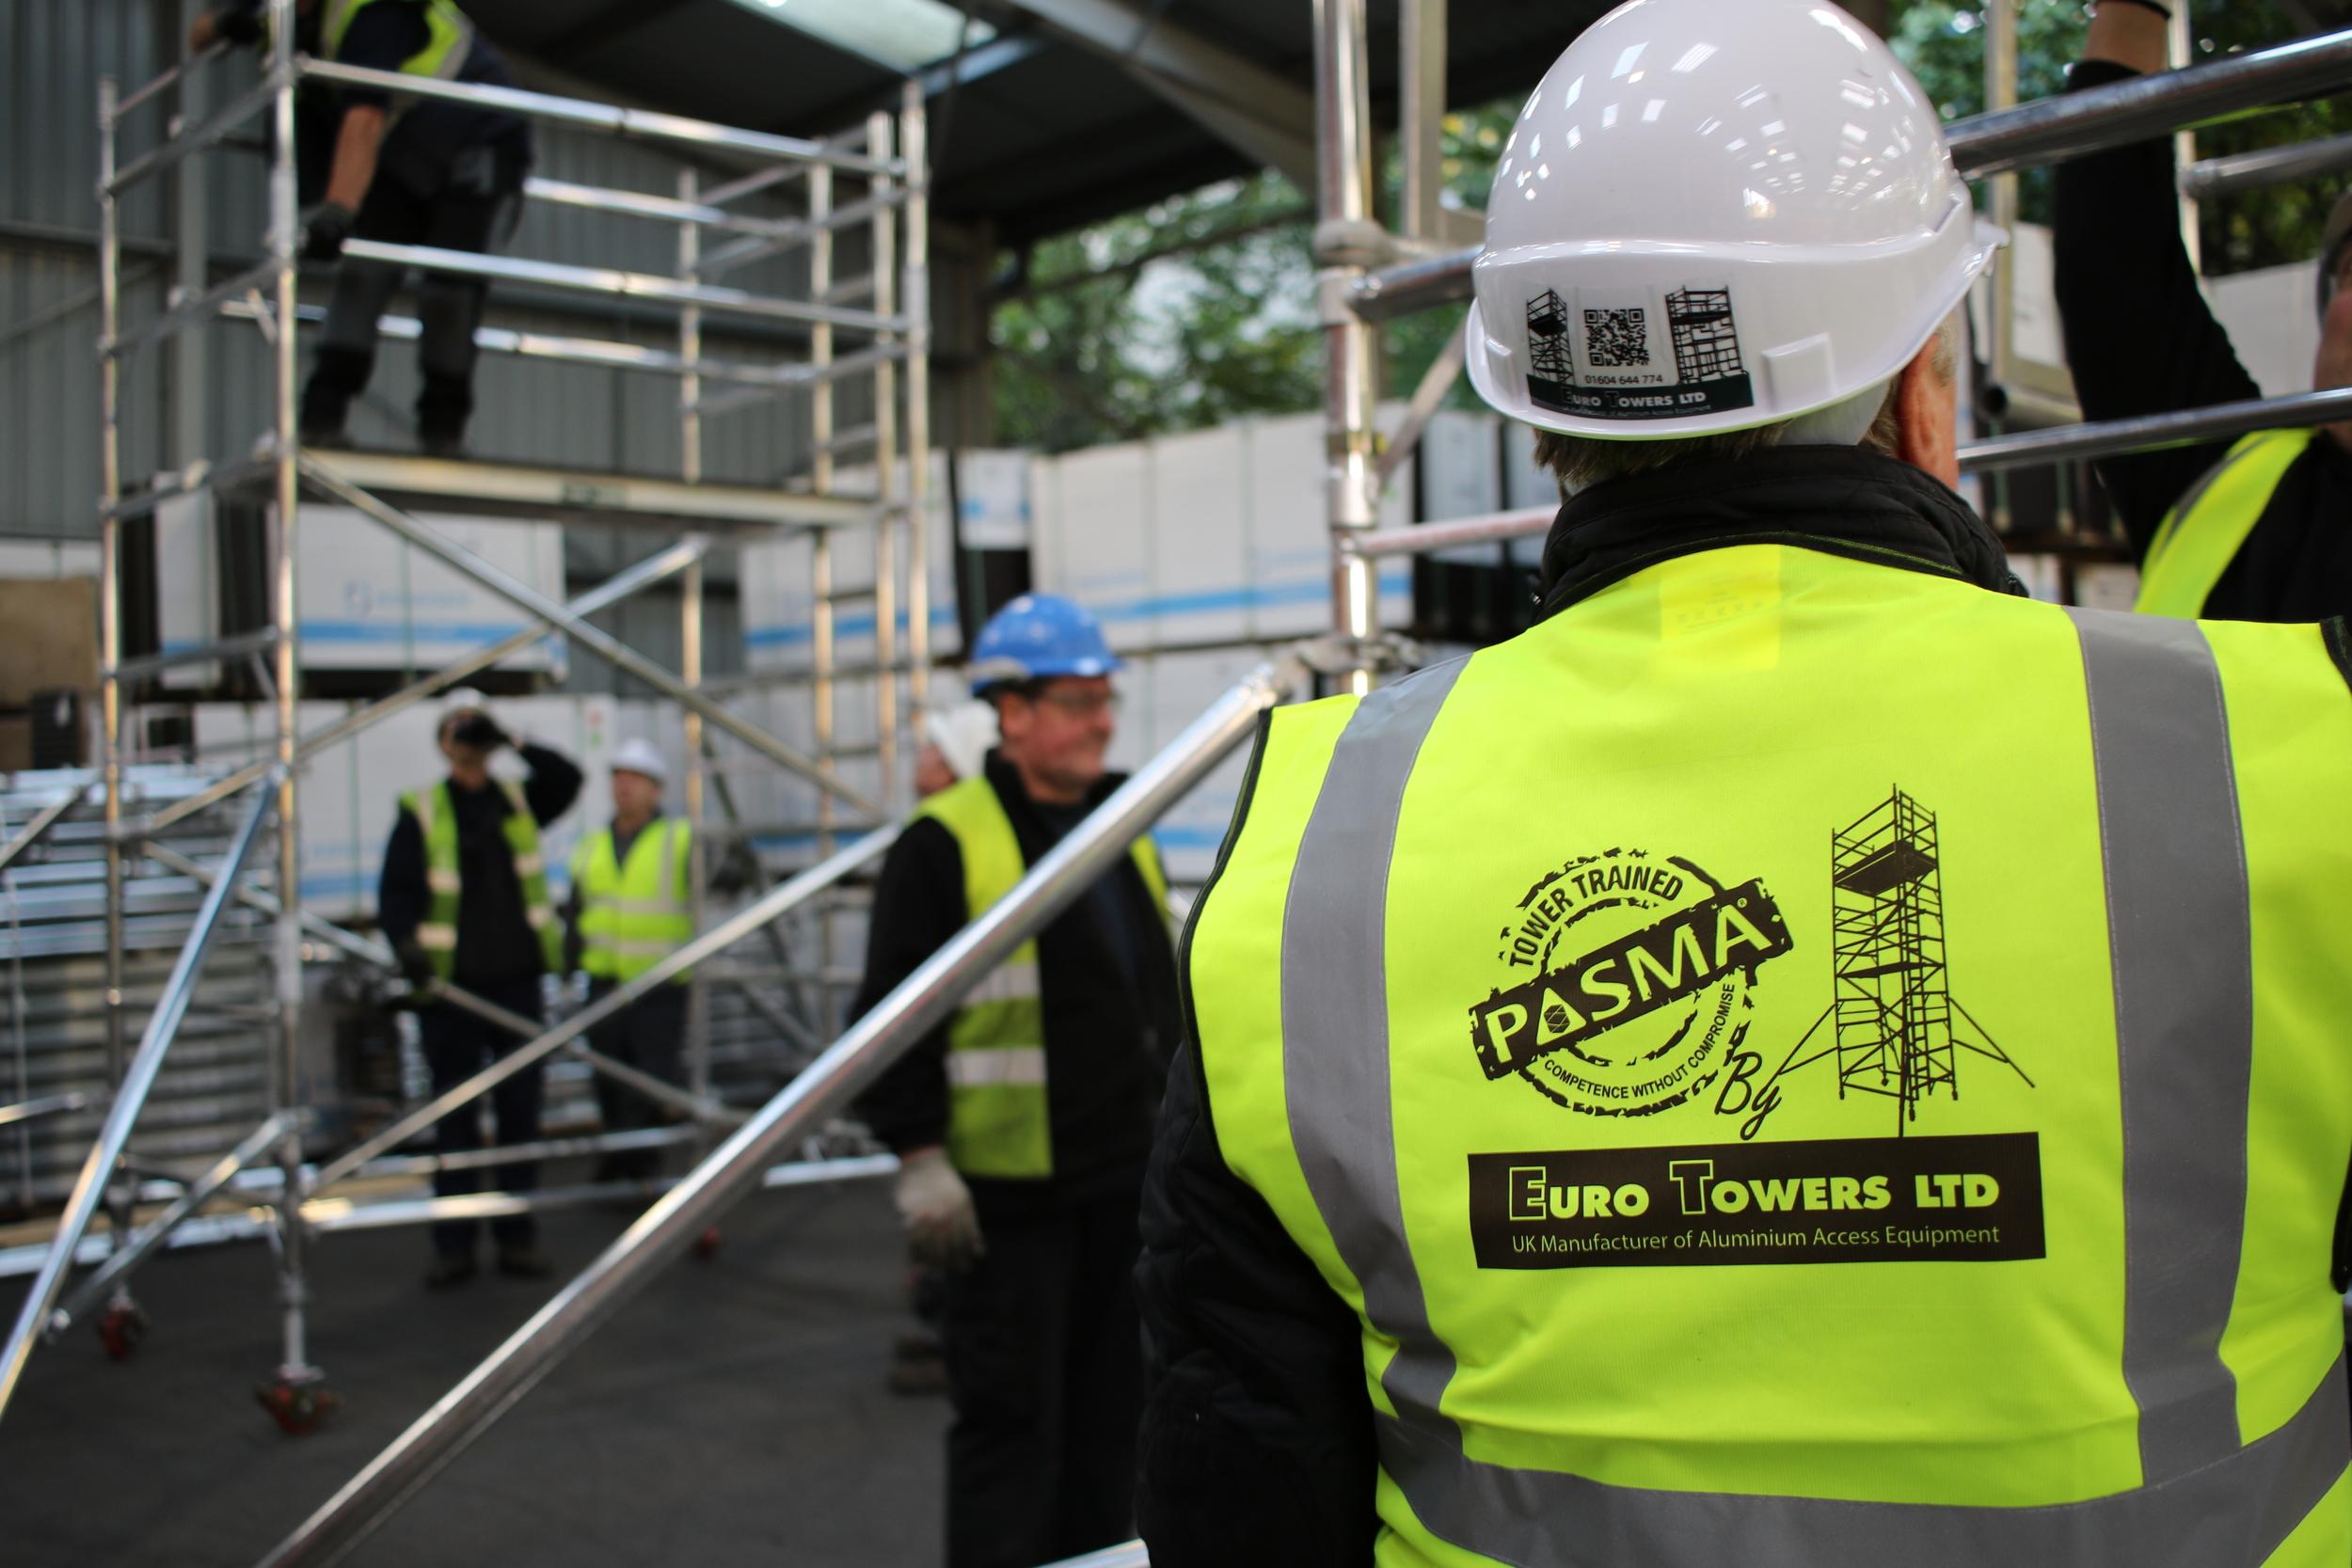 euro towers, PASMA training, 3T Tower, AGR Tower, Aluminium tower, Aluminium Scaffolding, Mobile scaffolding tower